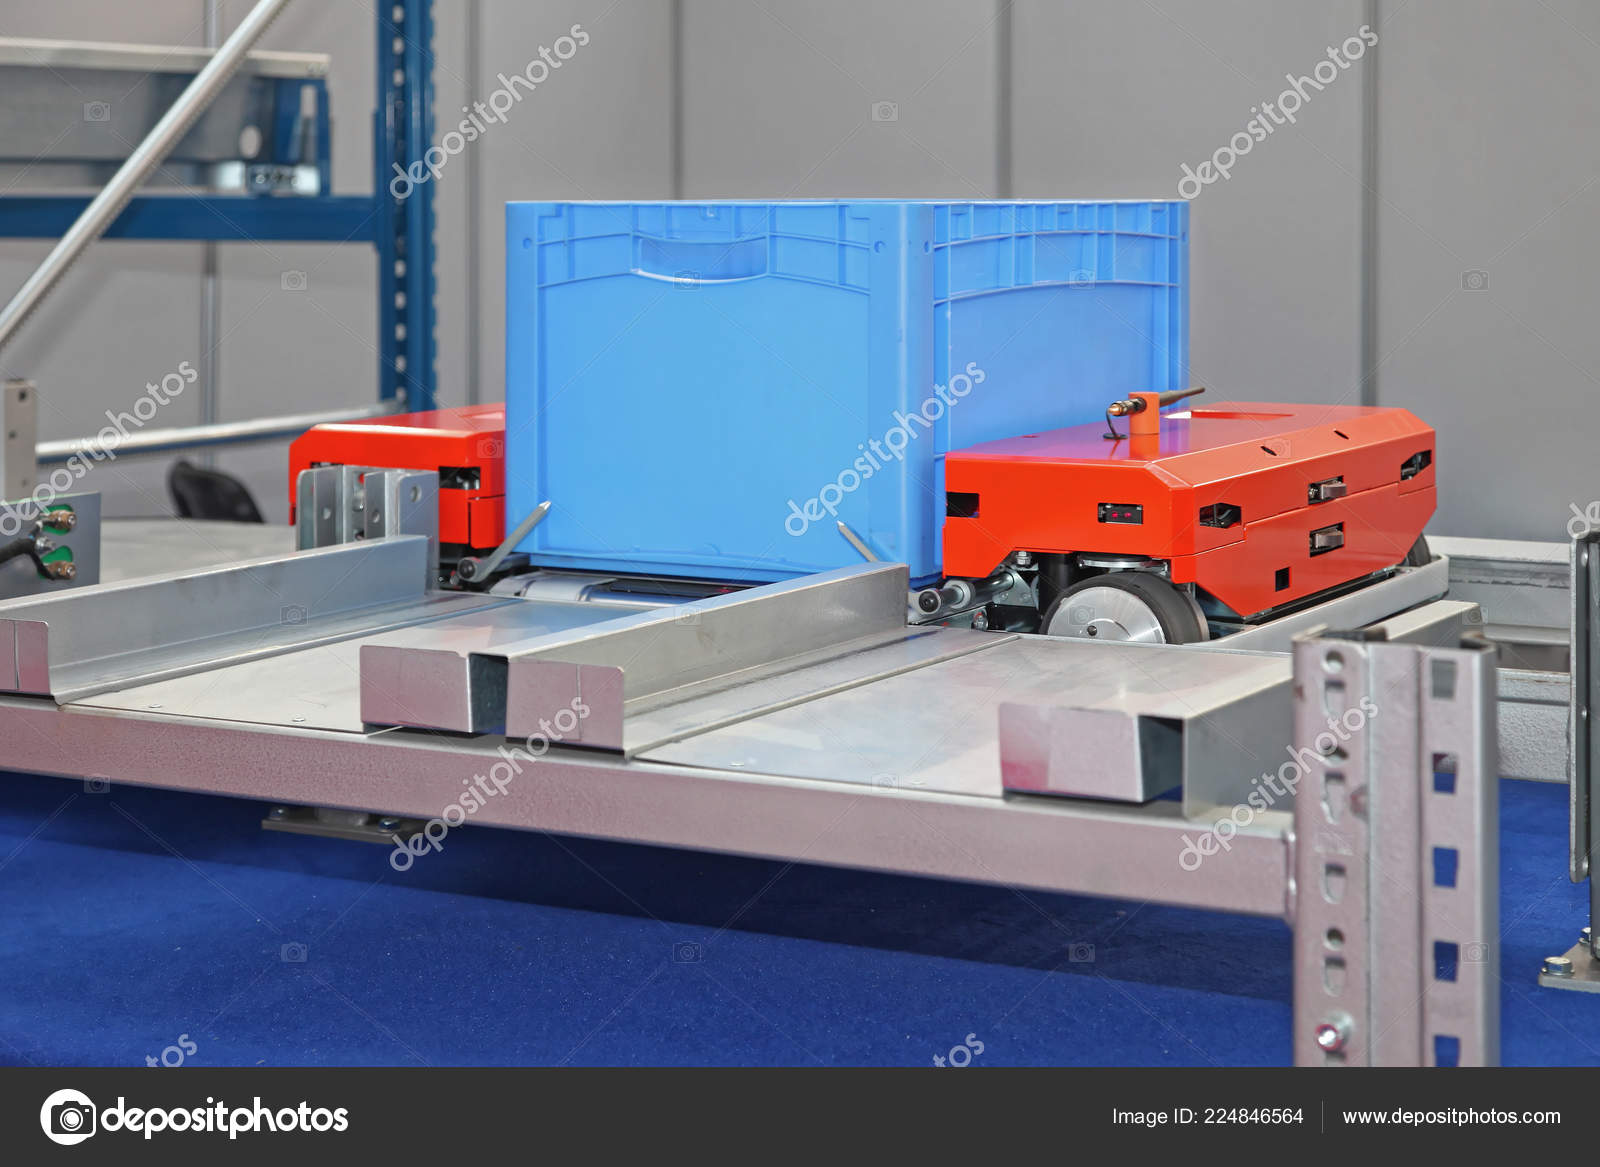 Automated Pallet Shuttle Crat Transport Shelves Warehouse